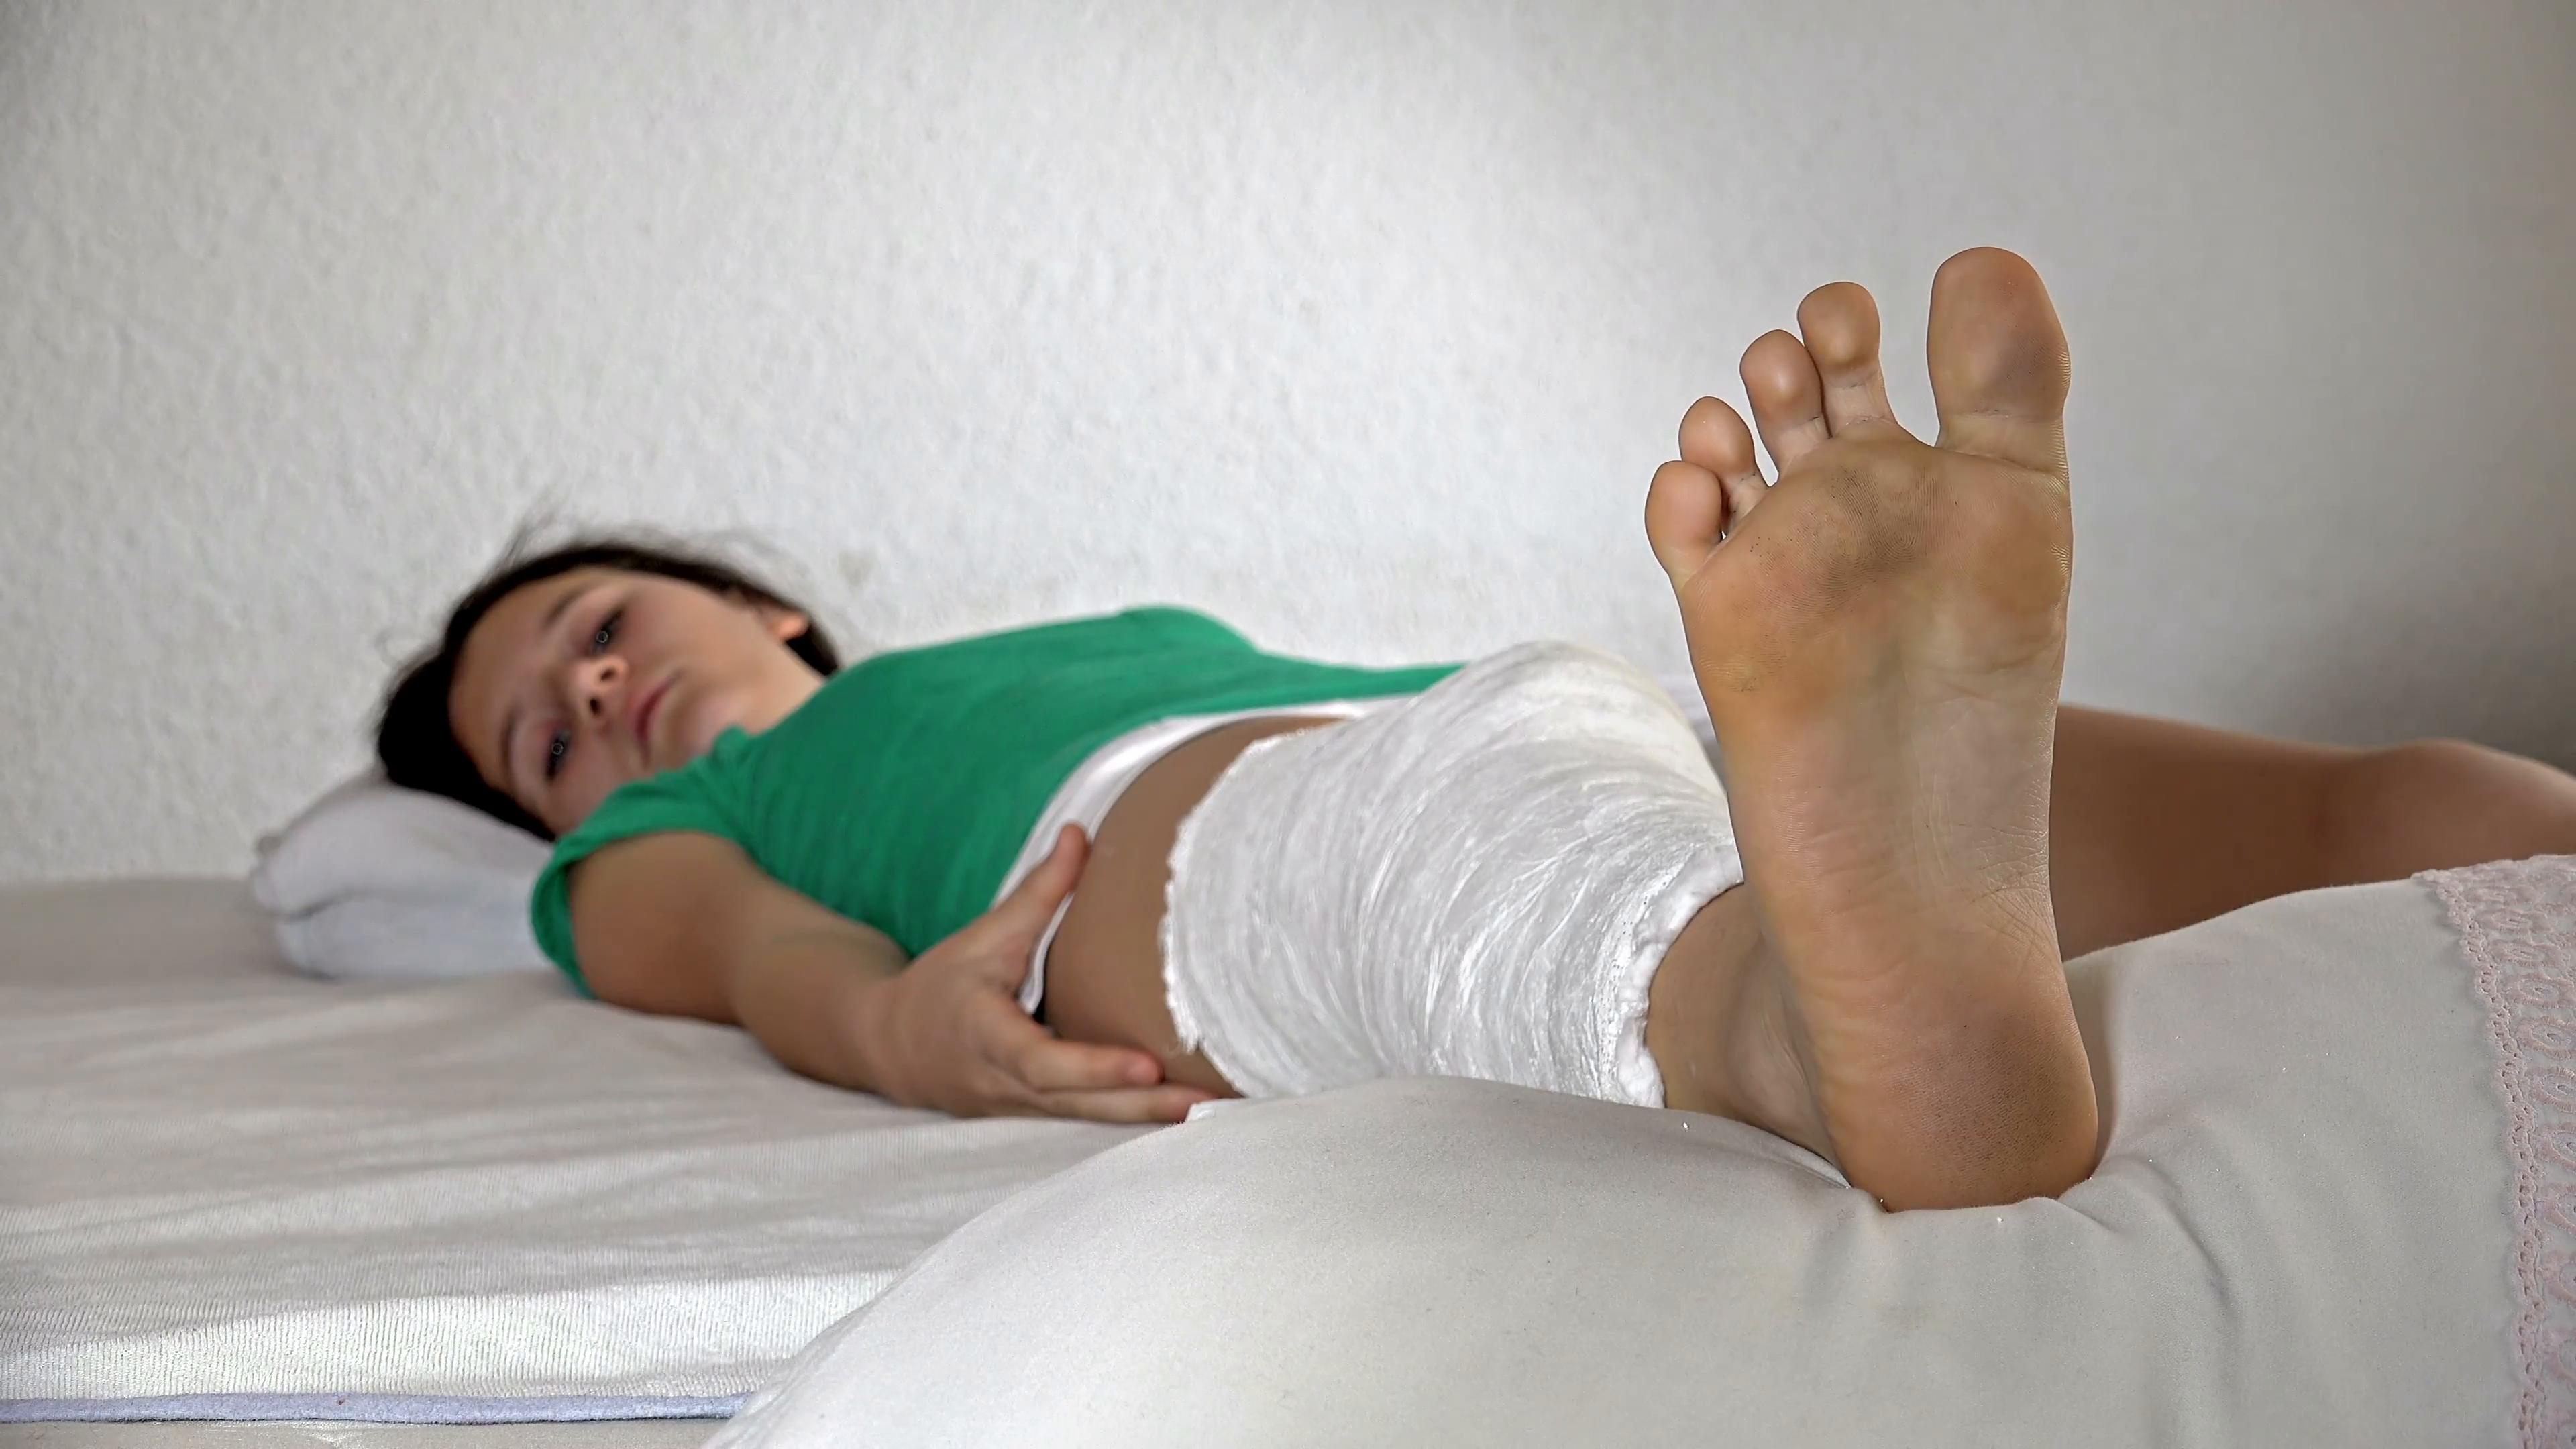 Broken Leg PNG HD - 120556